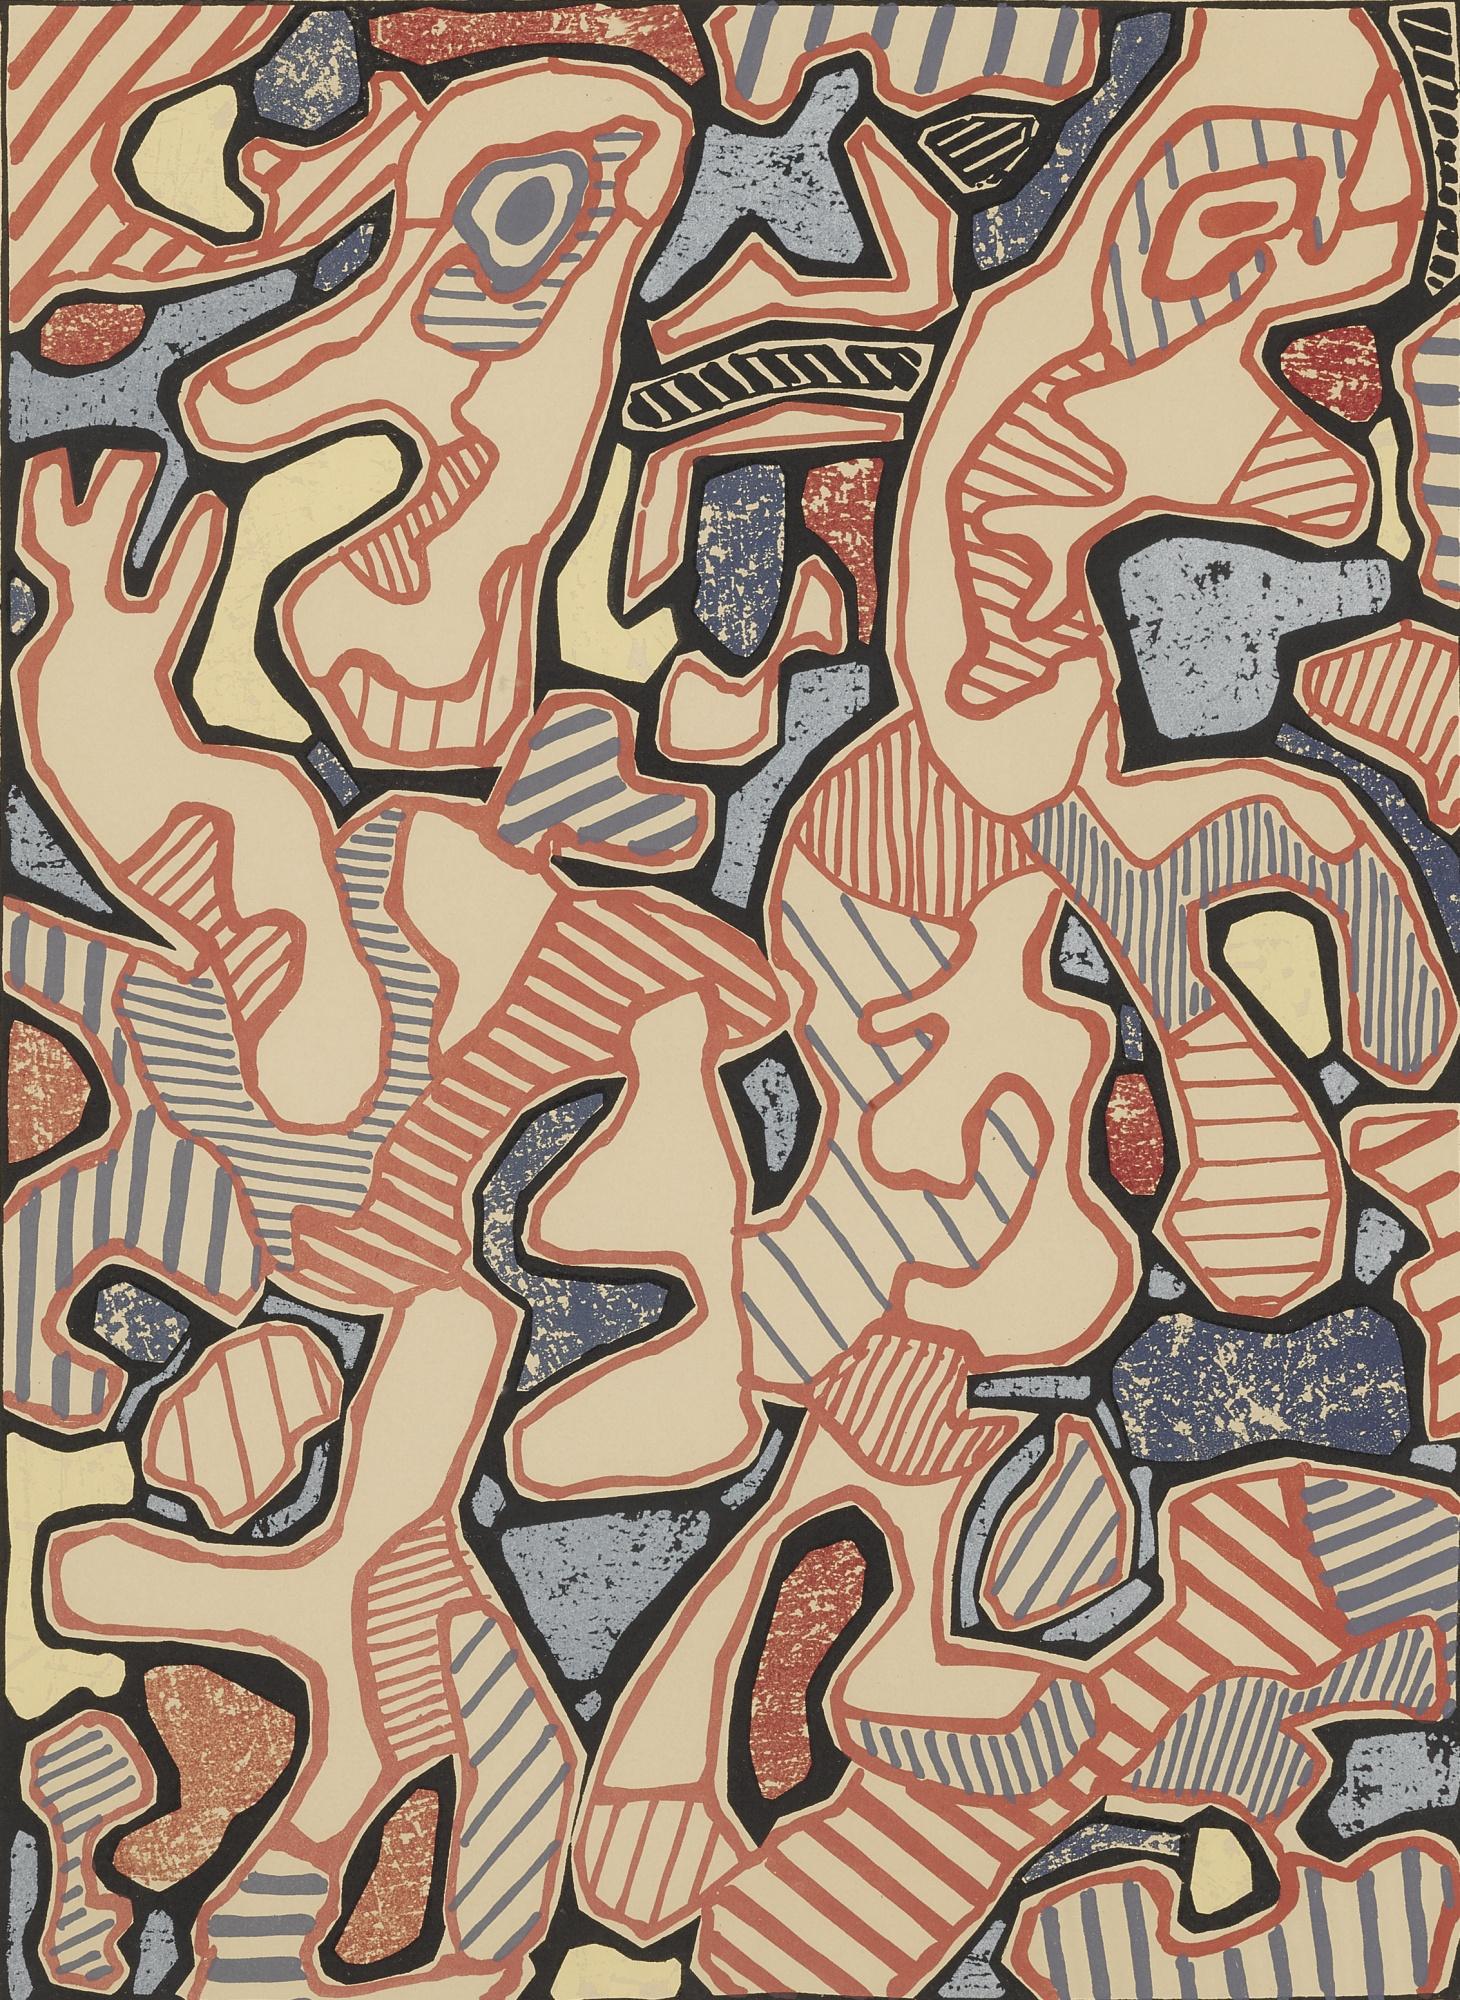 Jean Dubuffet-Affairements (W. 992)-1964